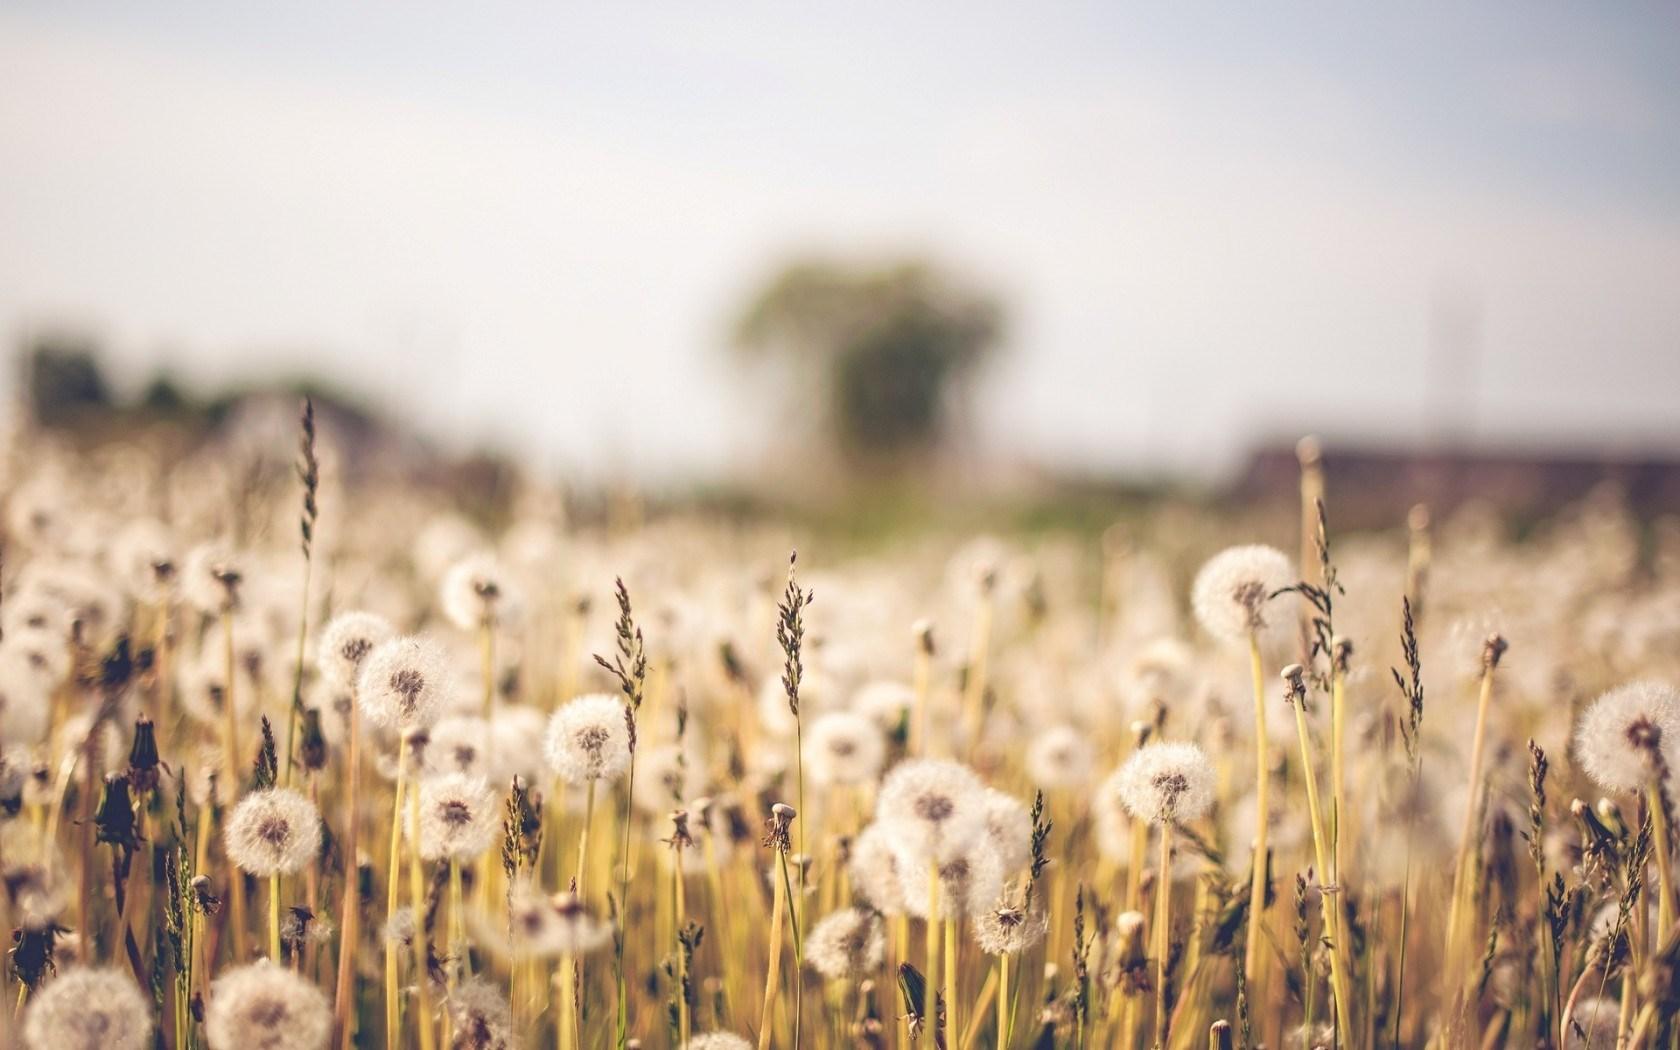 desktop wallpaper tumblr,nature,natural landscape,field,grass,sky